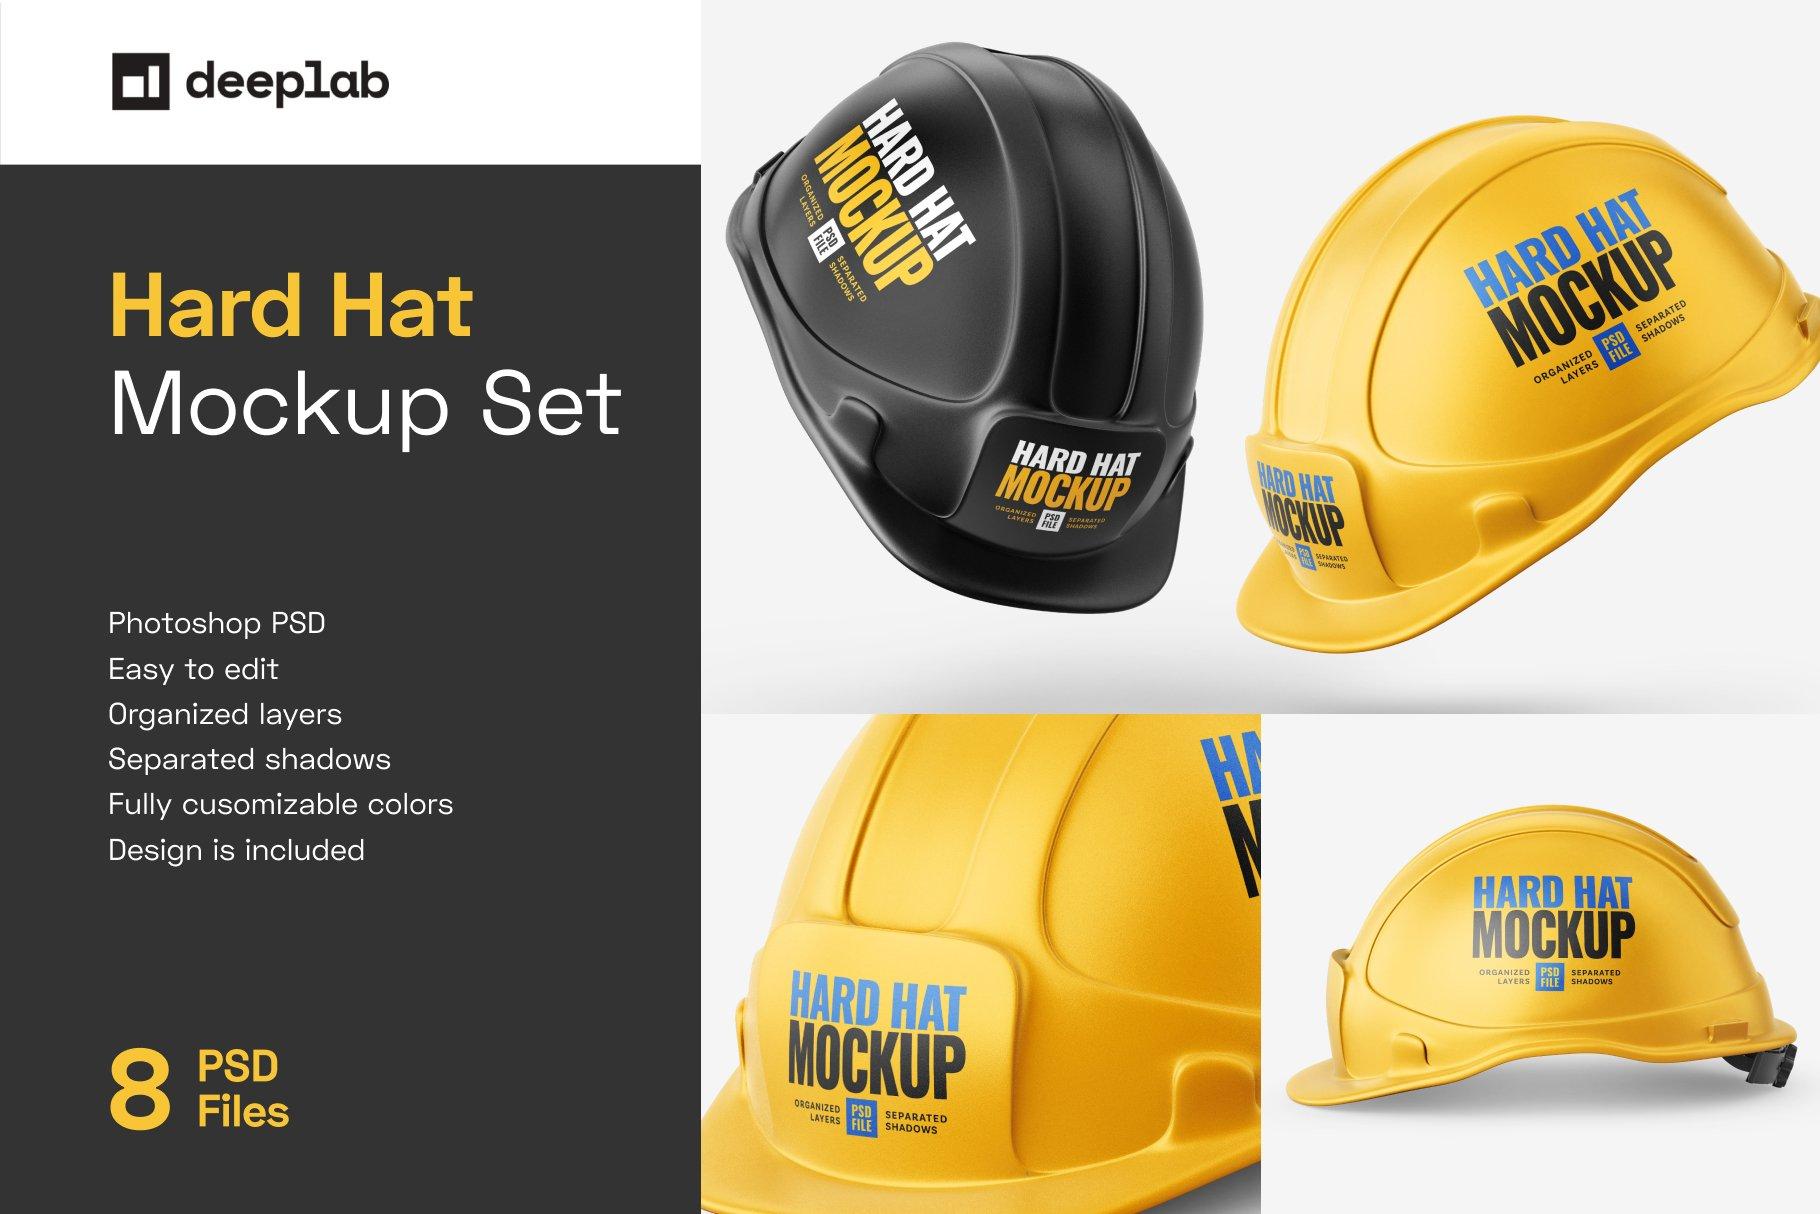 8款逼真工程安全帽头盔设计样机PSD模板素材 Construction Hard Hat Mockup Set插图